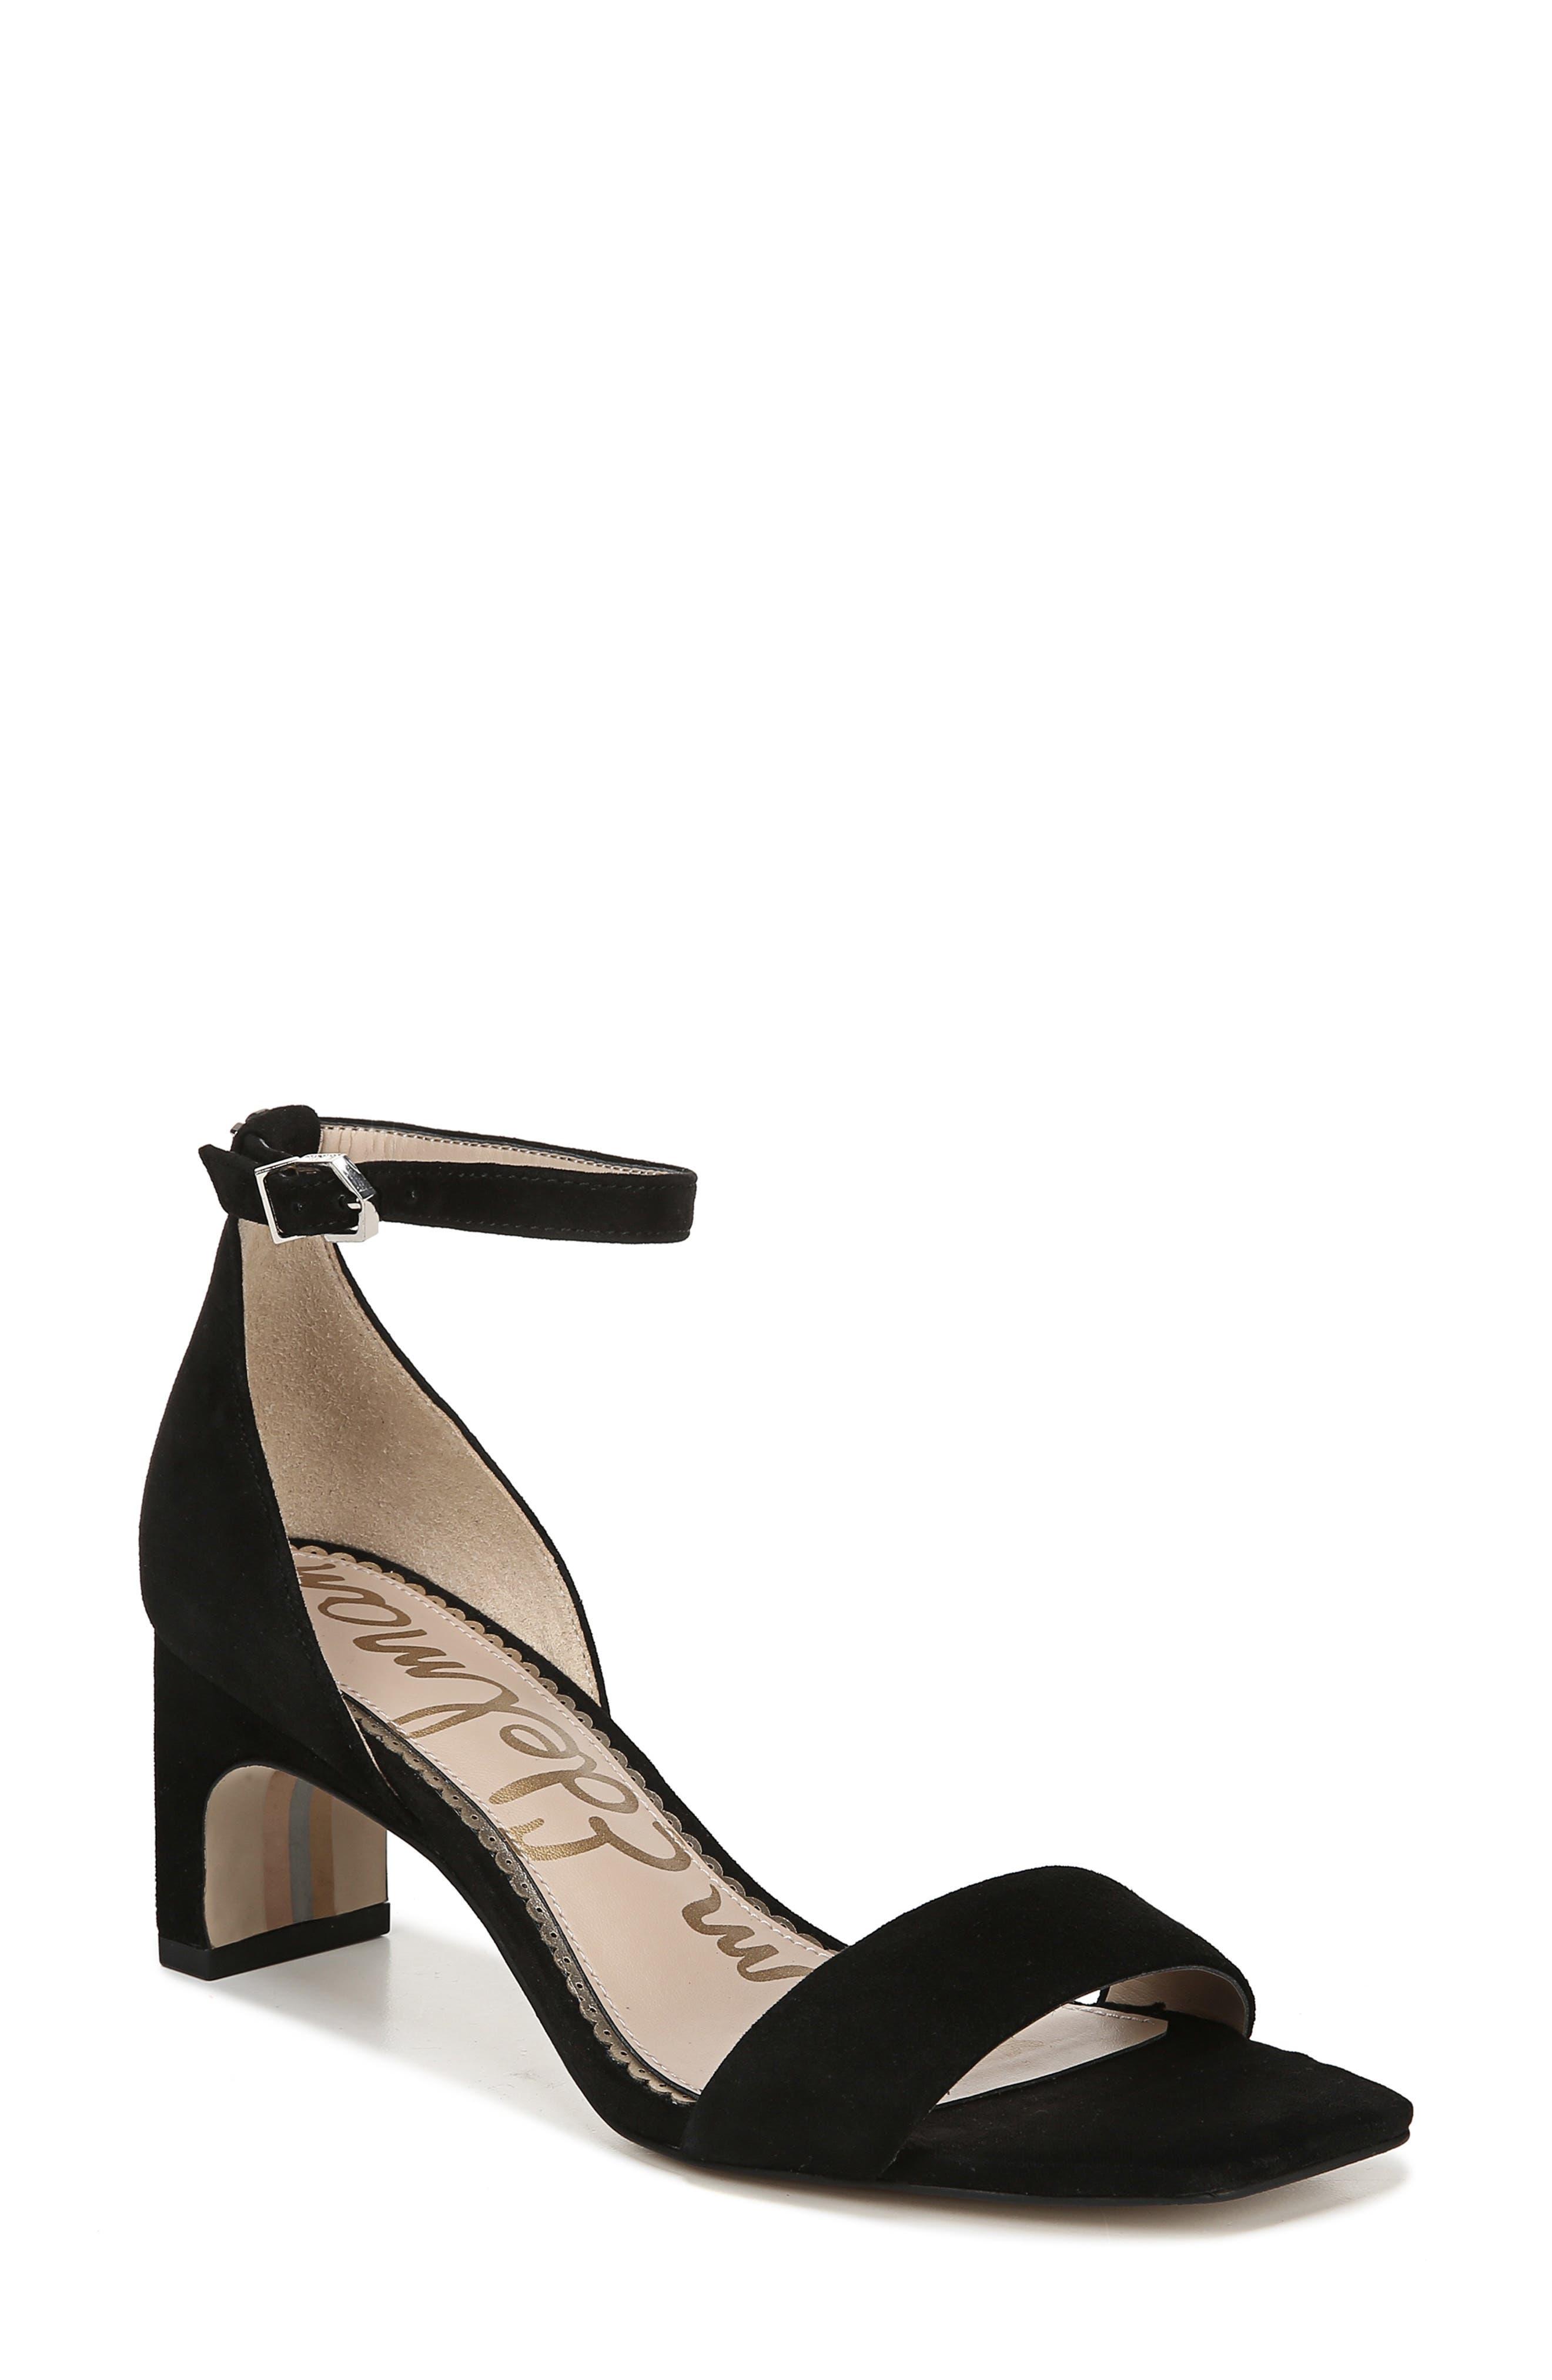 SAM EDELMAN, Holmes Ankle Strap Sandal, Main thumbnail 1, color, BLACK SUEDE LEATHER